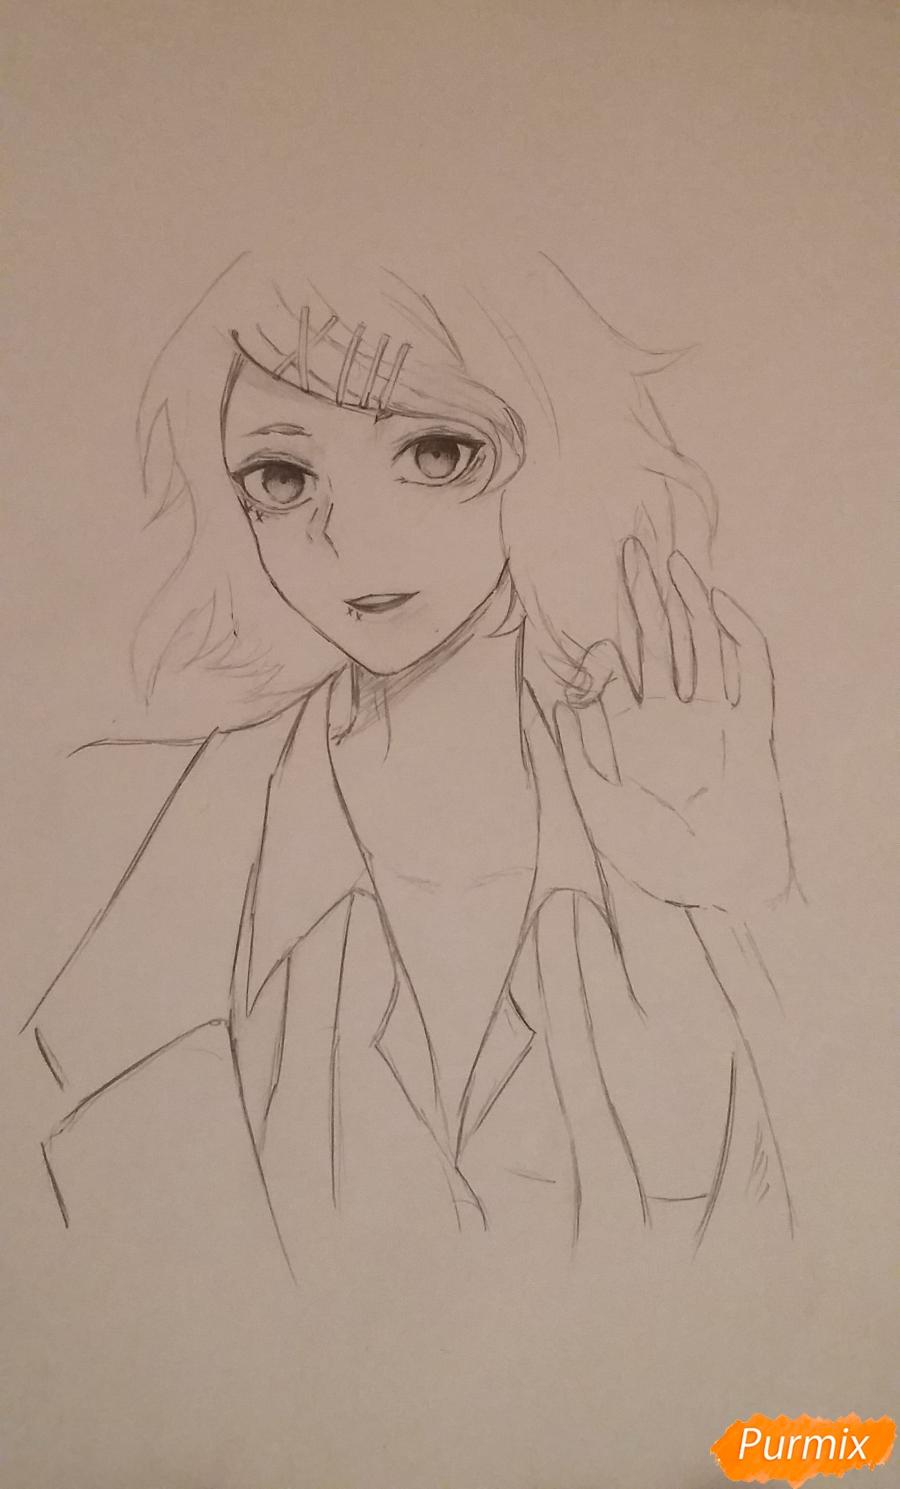 Рисуем портрет Дзюдзо Судзую - шаг 7